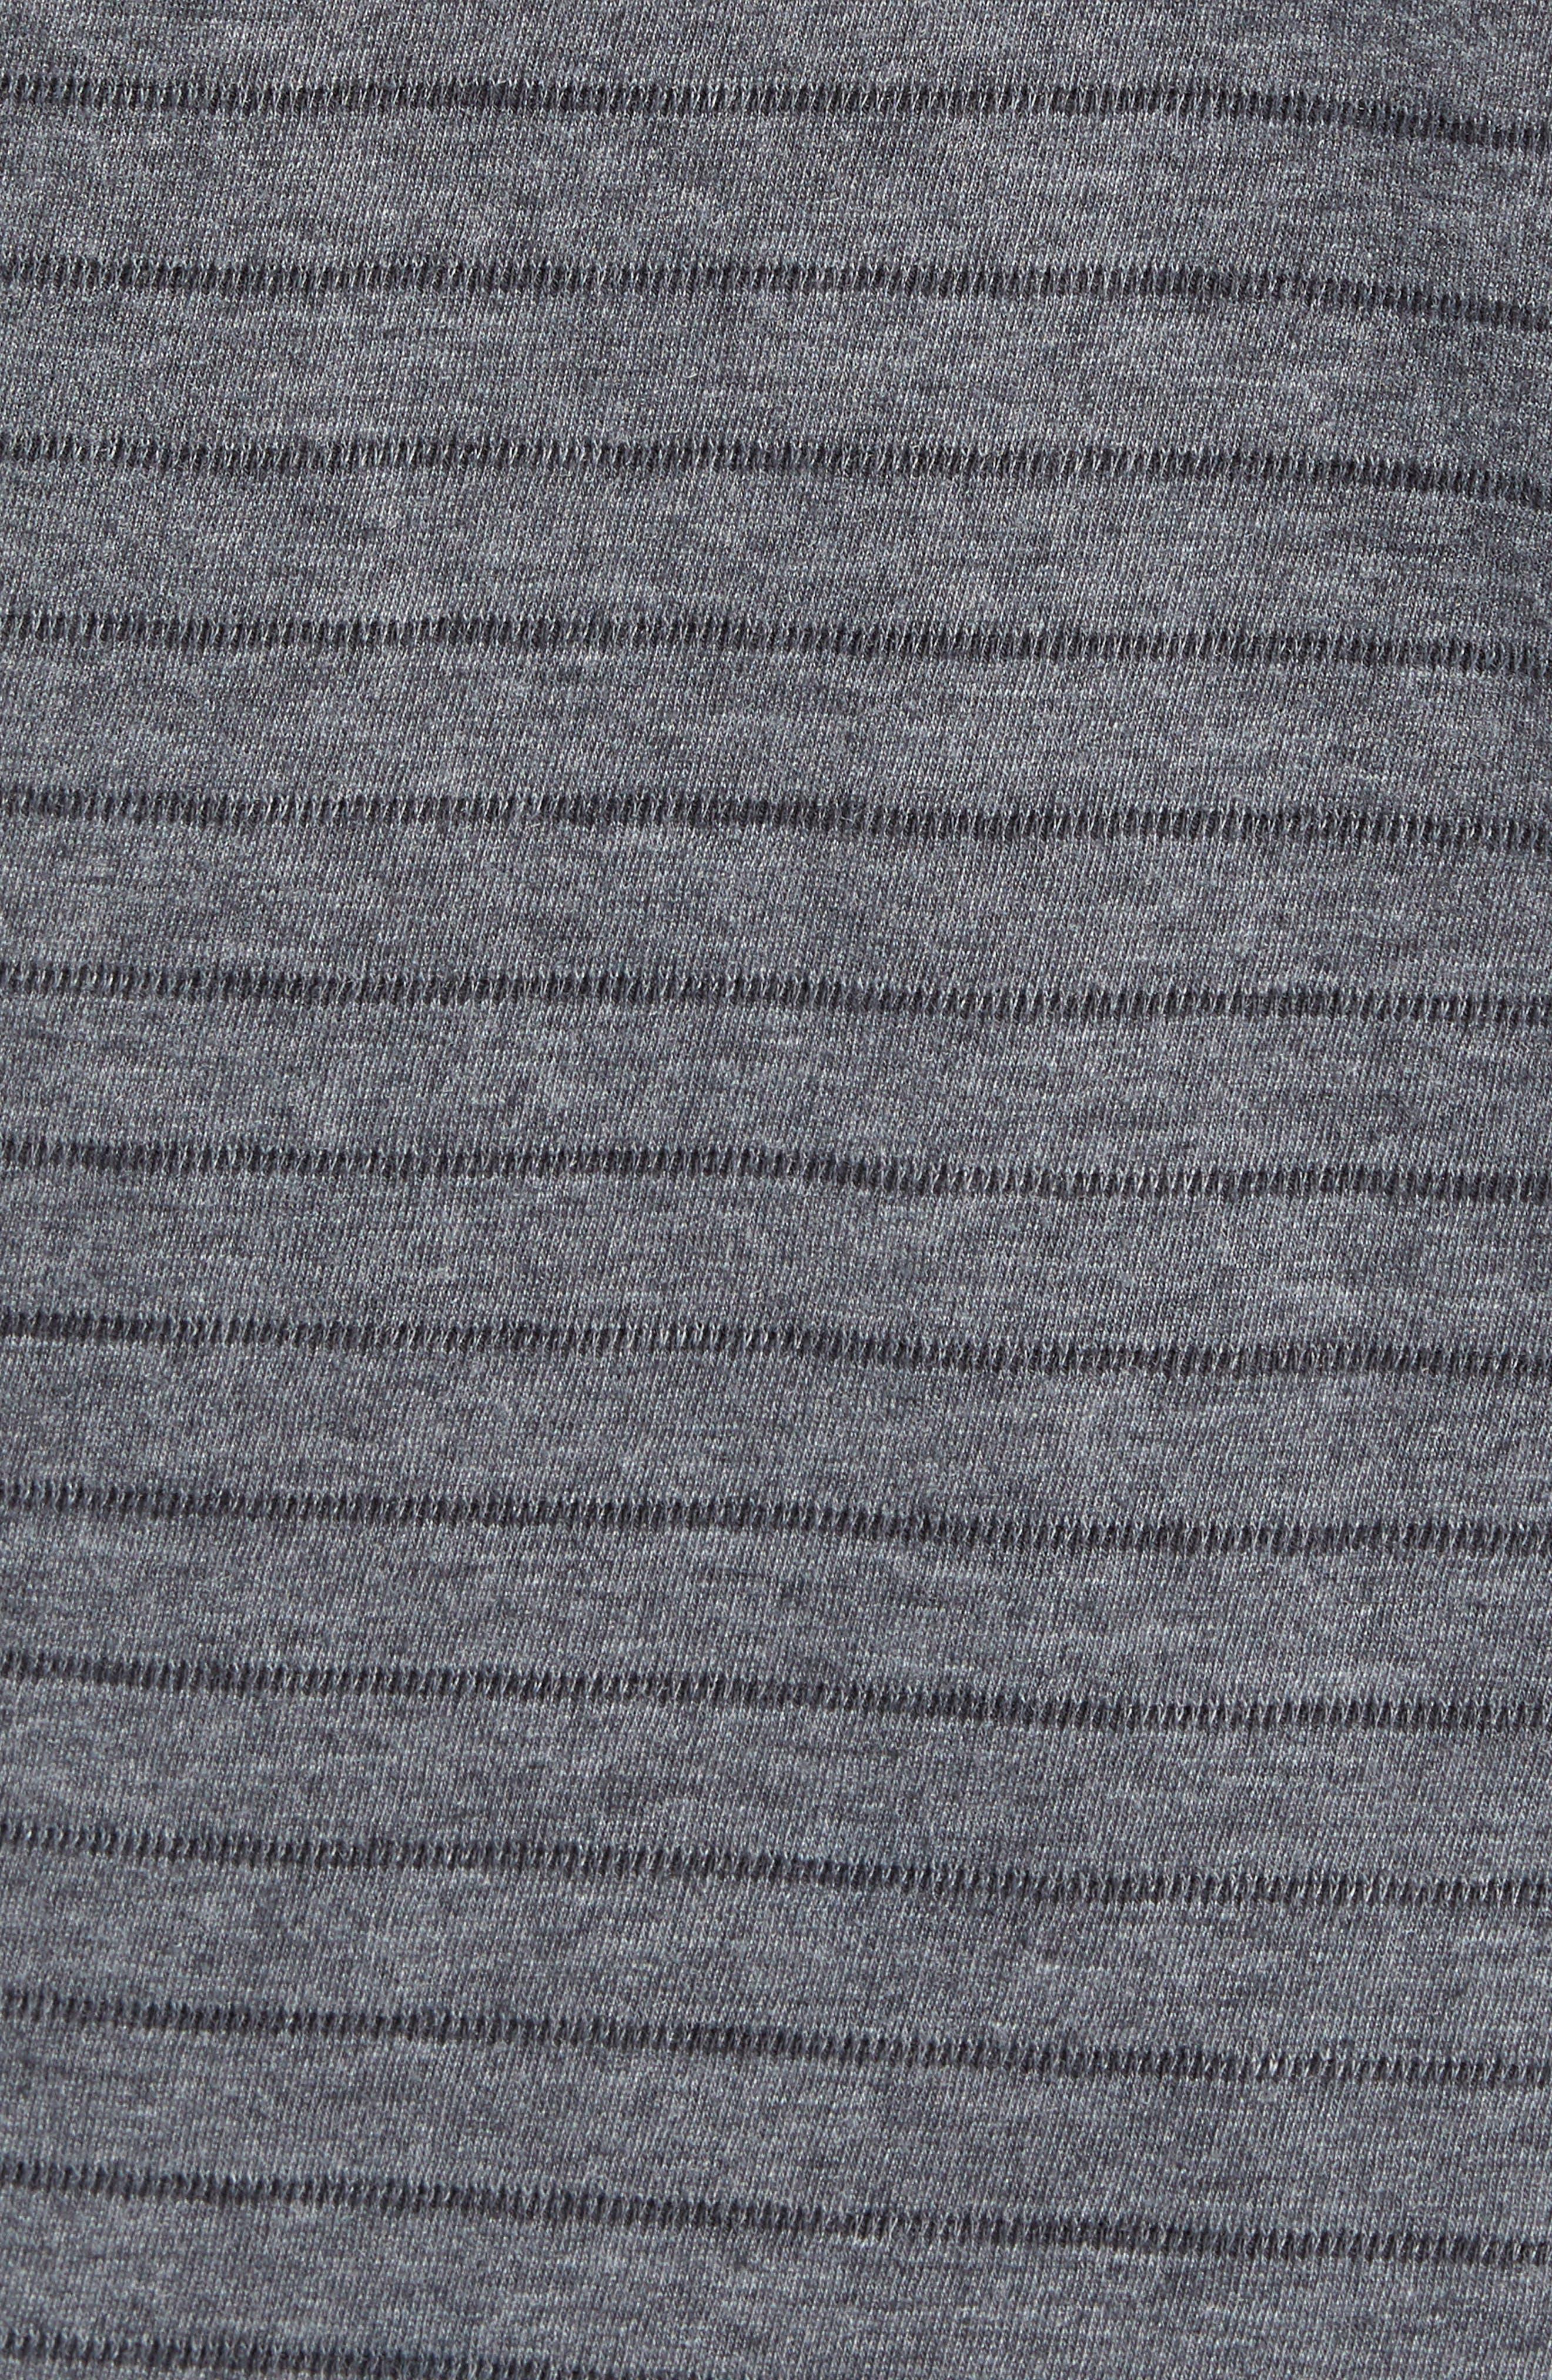 Annapolis Long Sleeve Polo,                             Alternate thumbnail 5, color,                             020